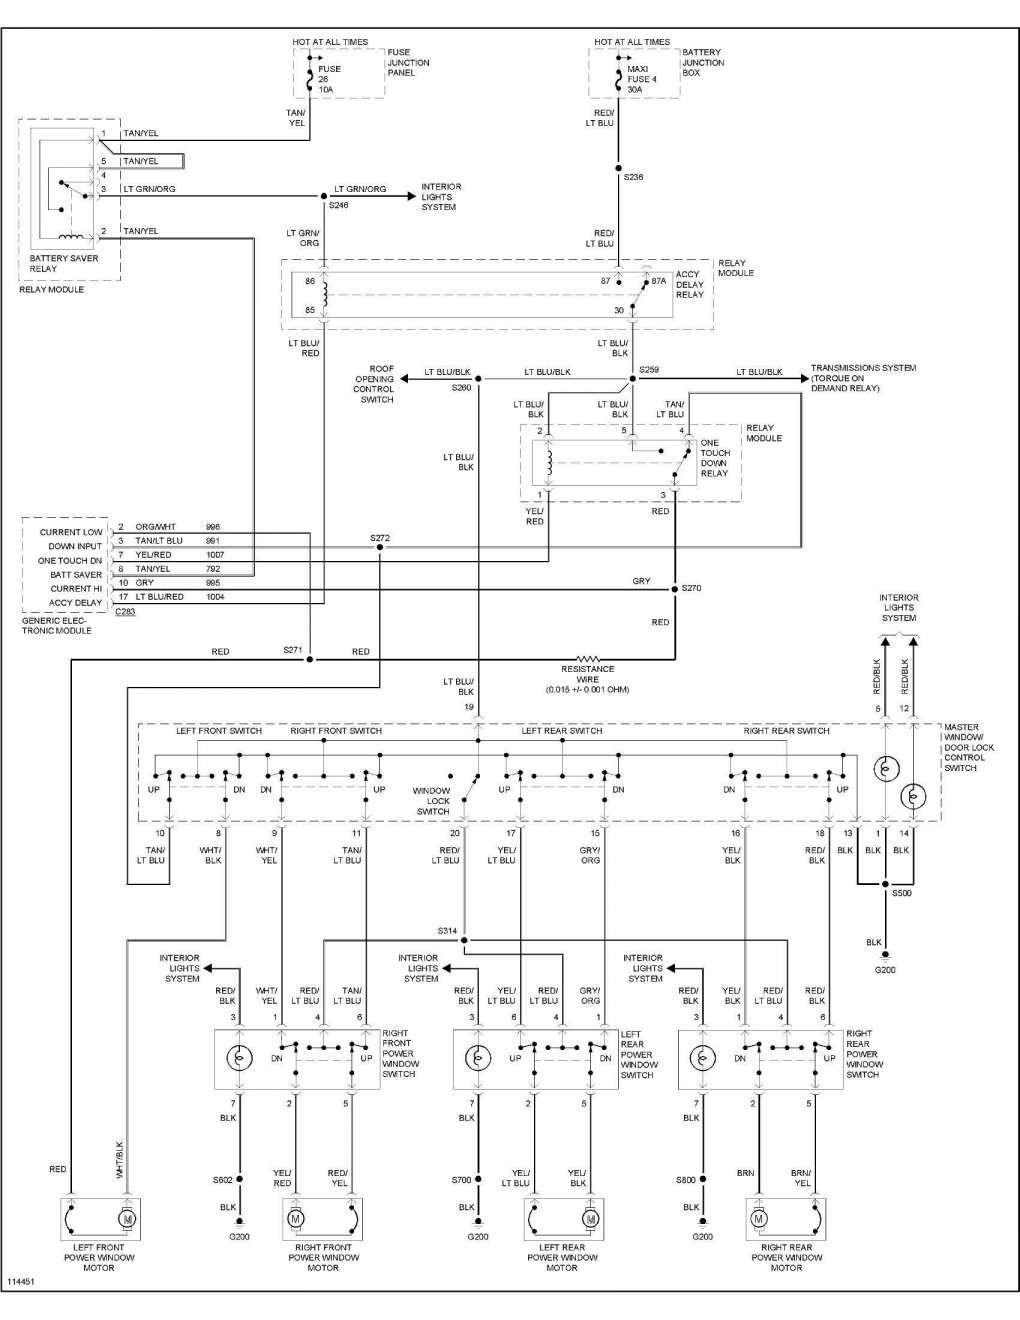 18 Smart Car Fortwo Wiring Diagram Ford Explorer Smart Car Fuse Box